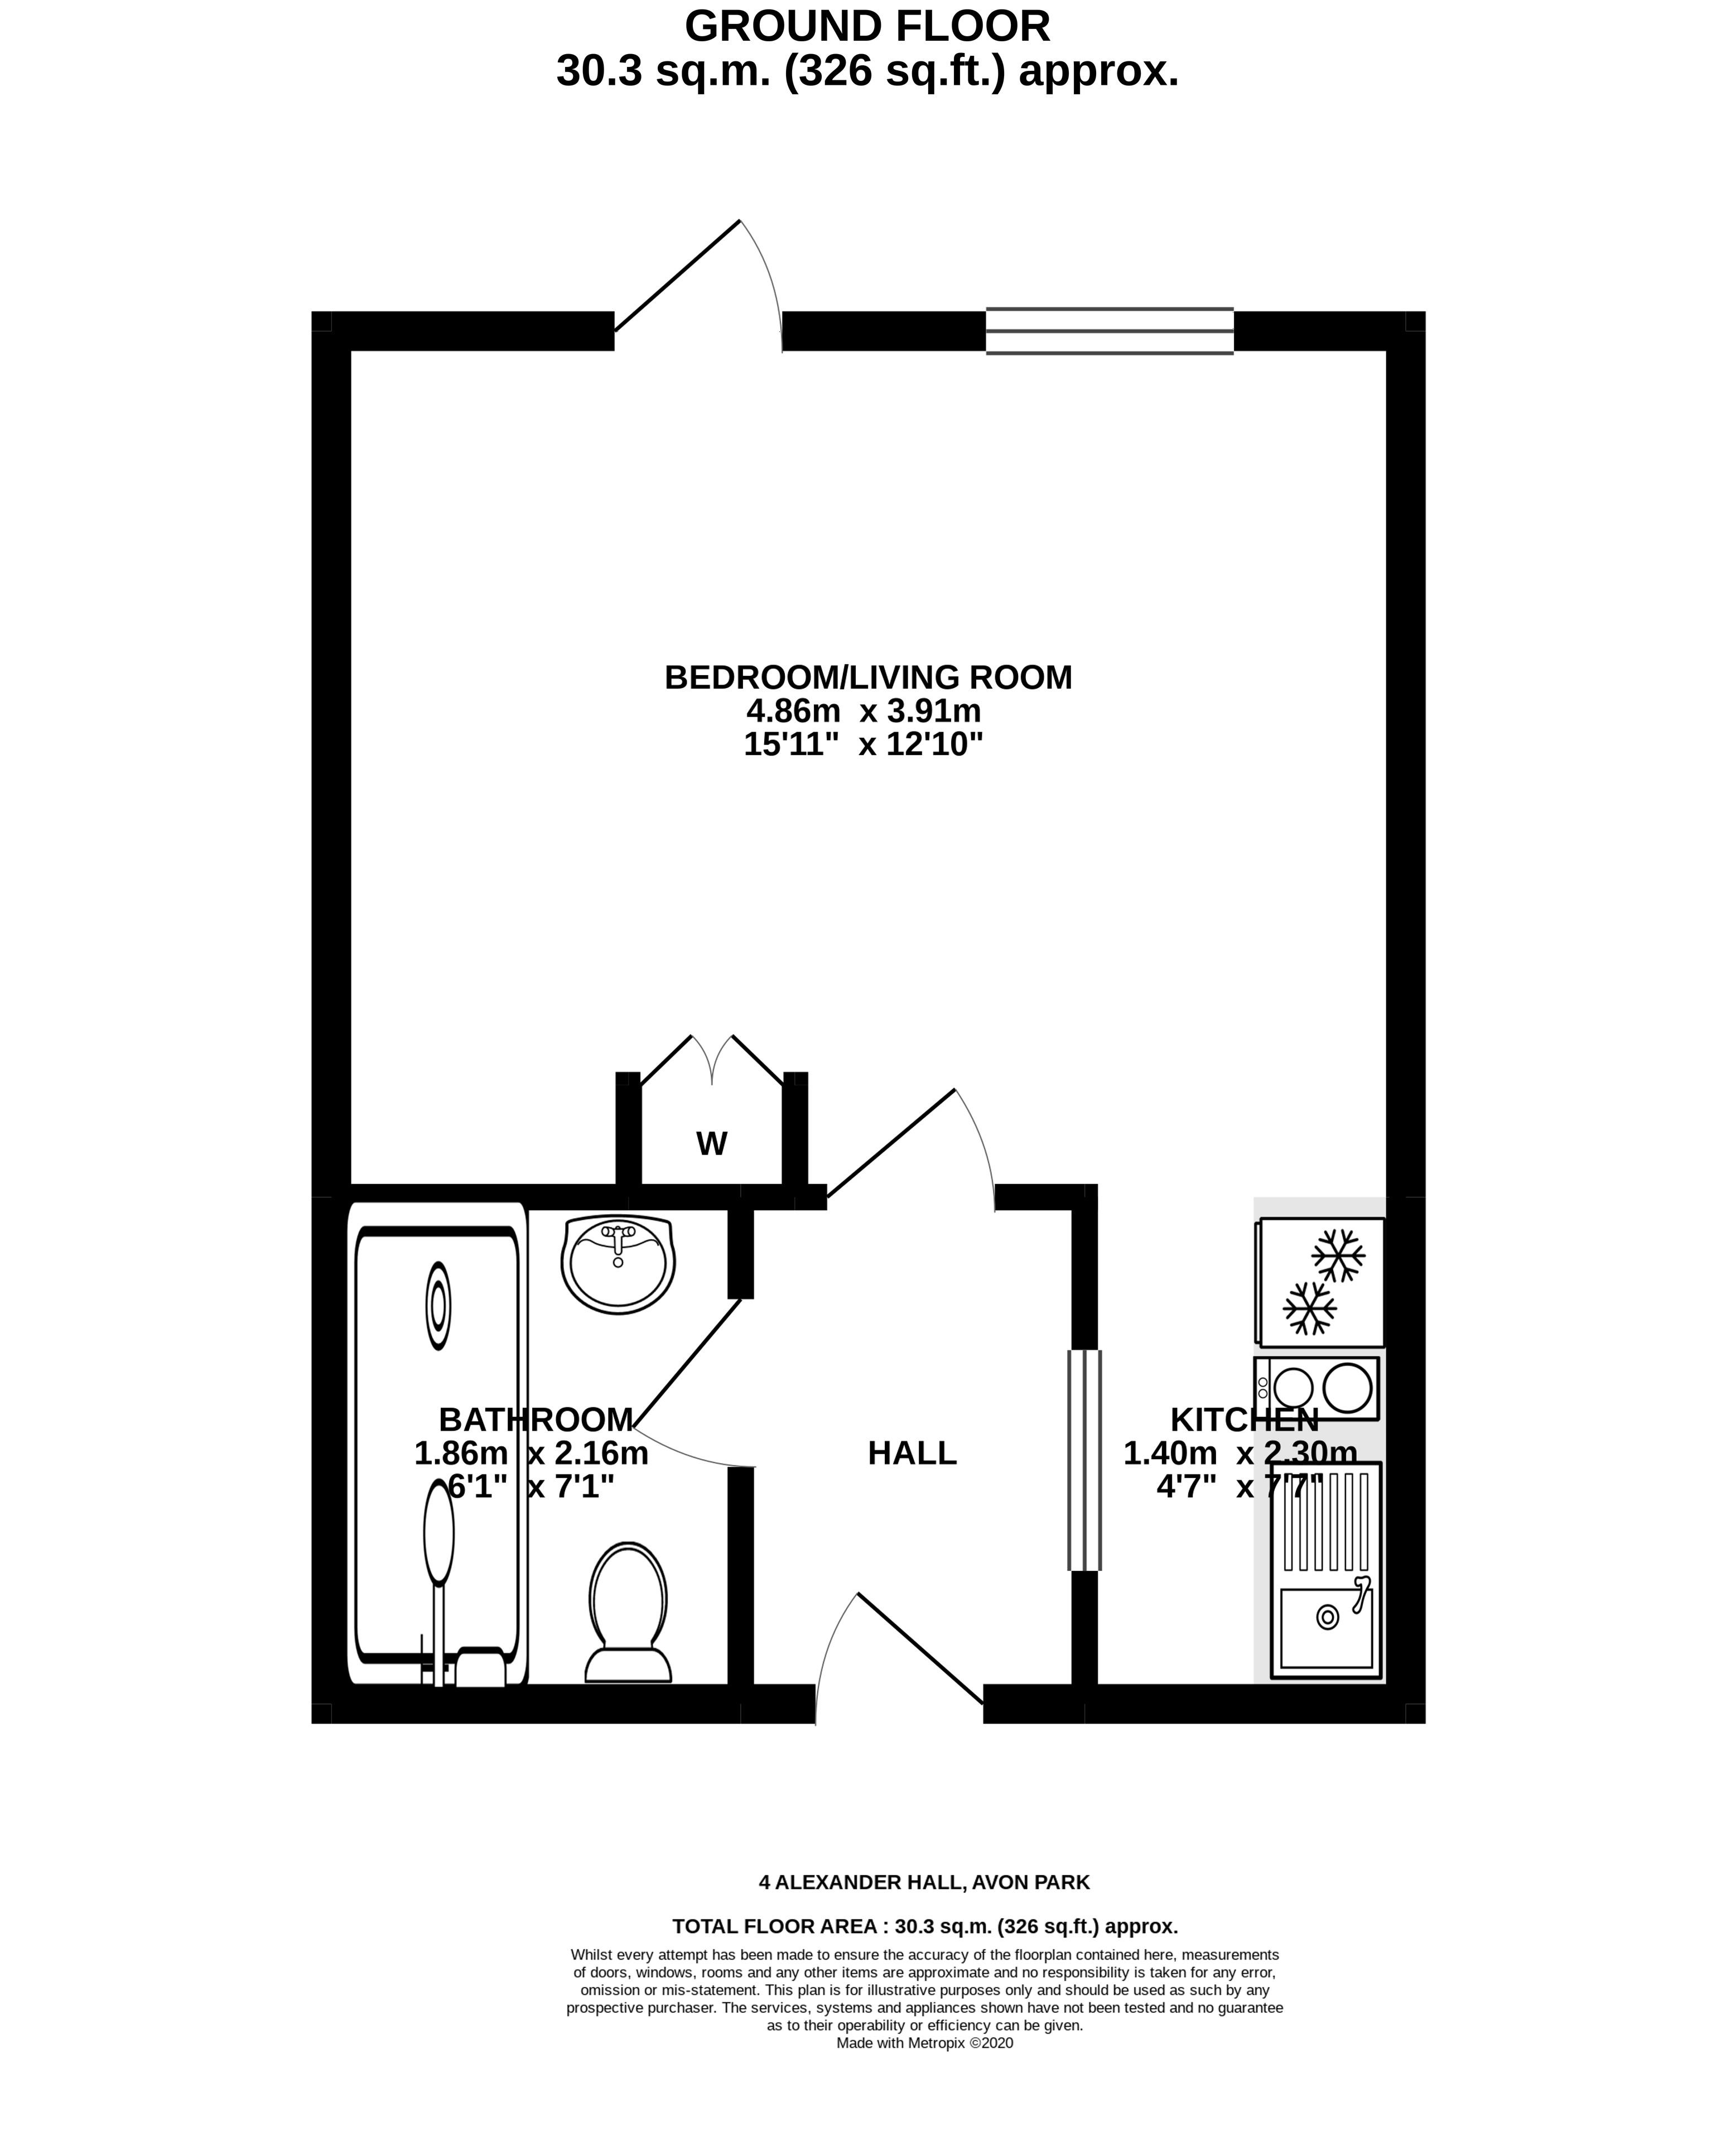 4 Alexander Hall Floorplan